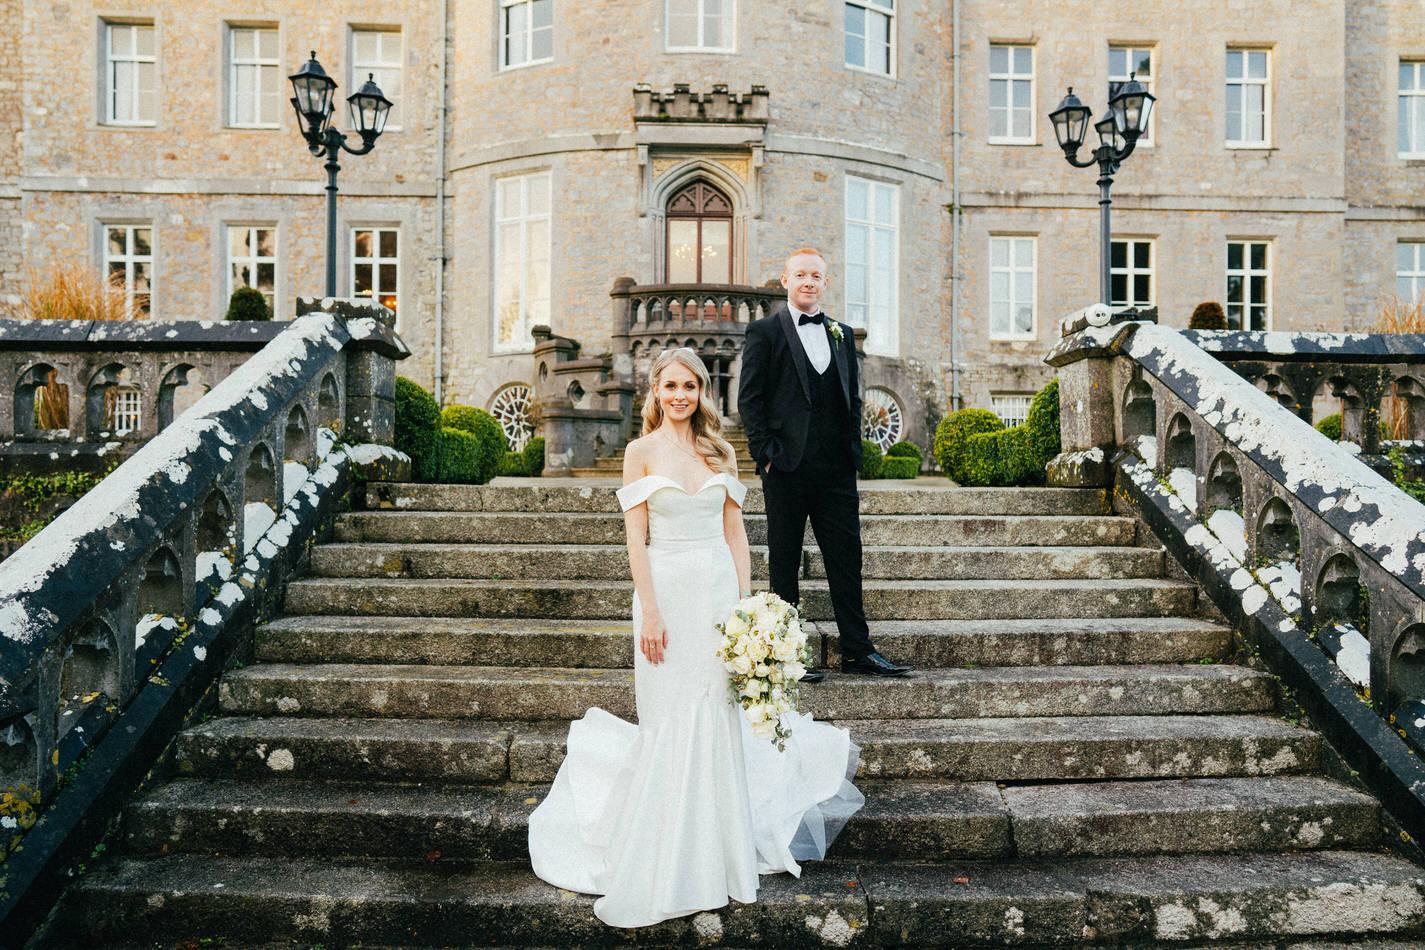 Castle-wedding-ireland-photos- 0193 137